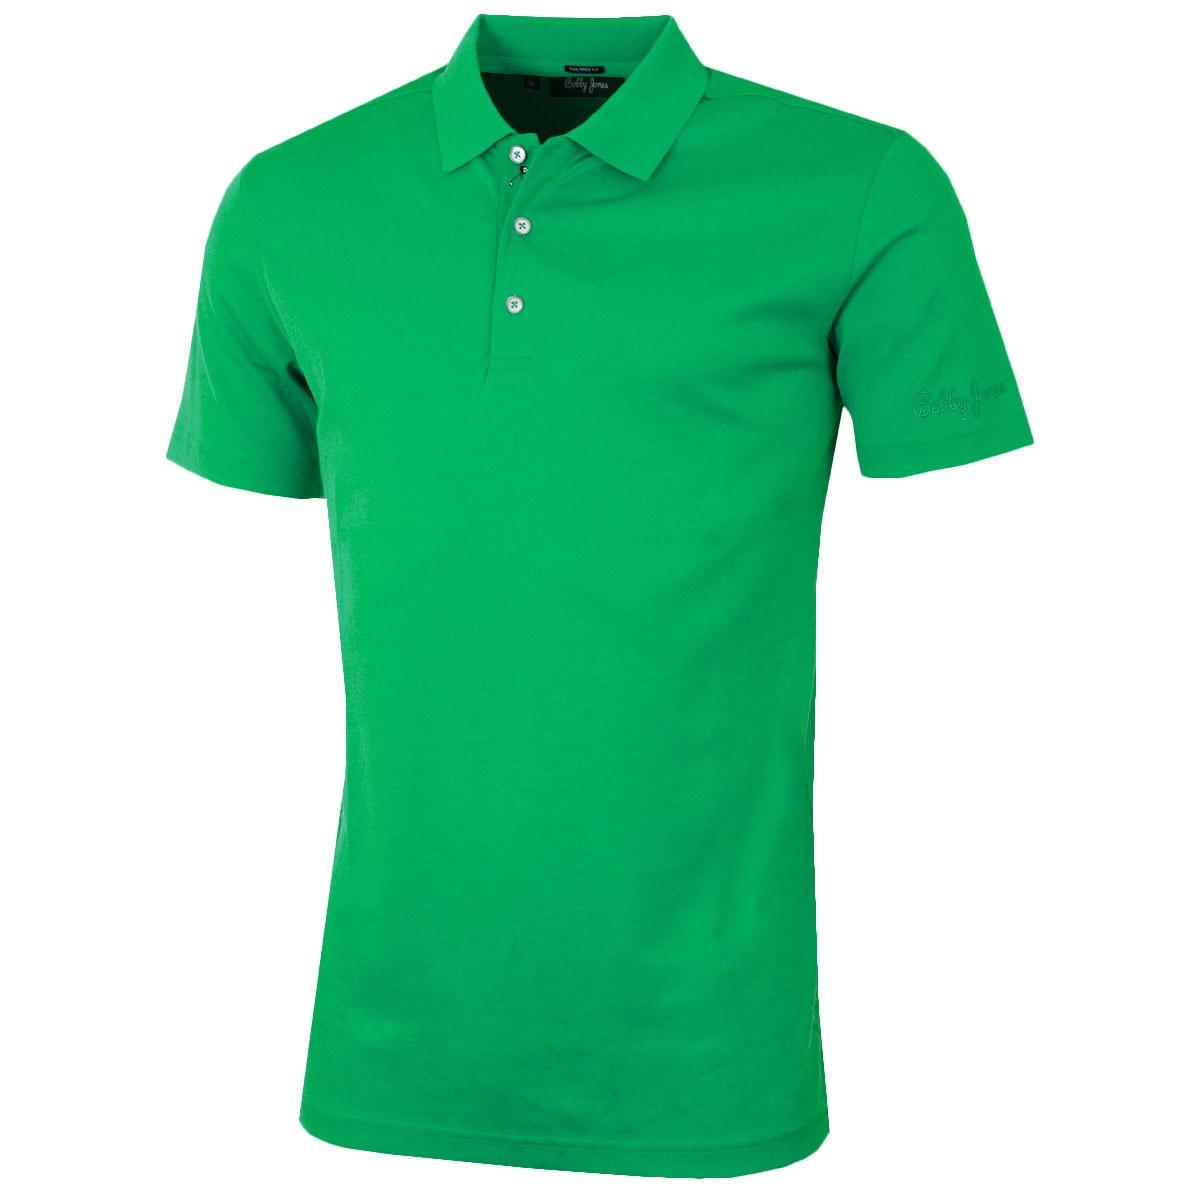 33ac11531 Bobby Jones Mens Solid Supreme Cotton TF Golf Polo Shirt - Tree Present